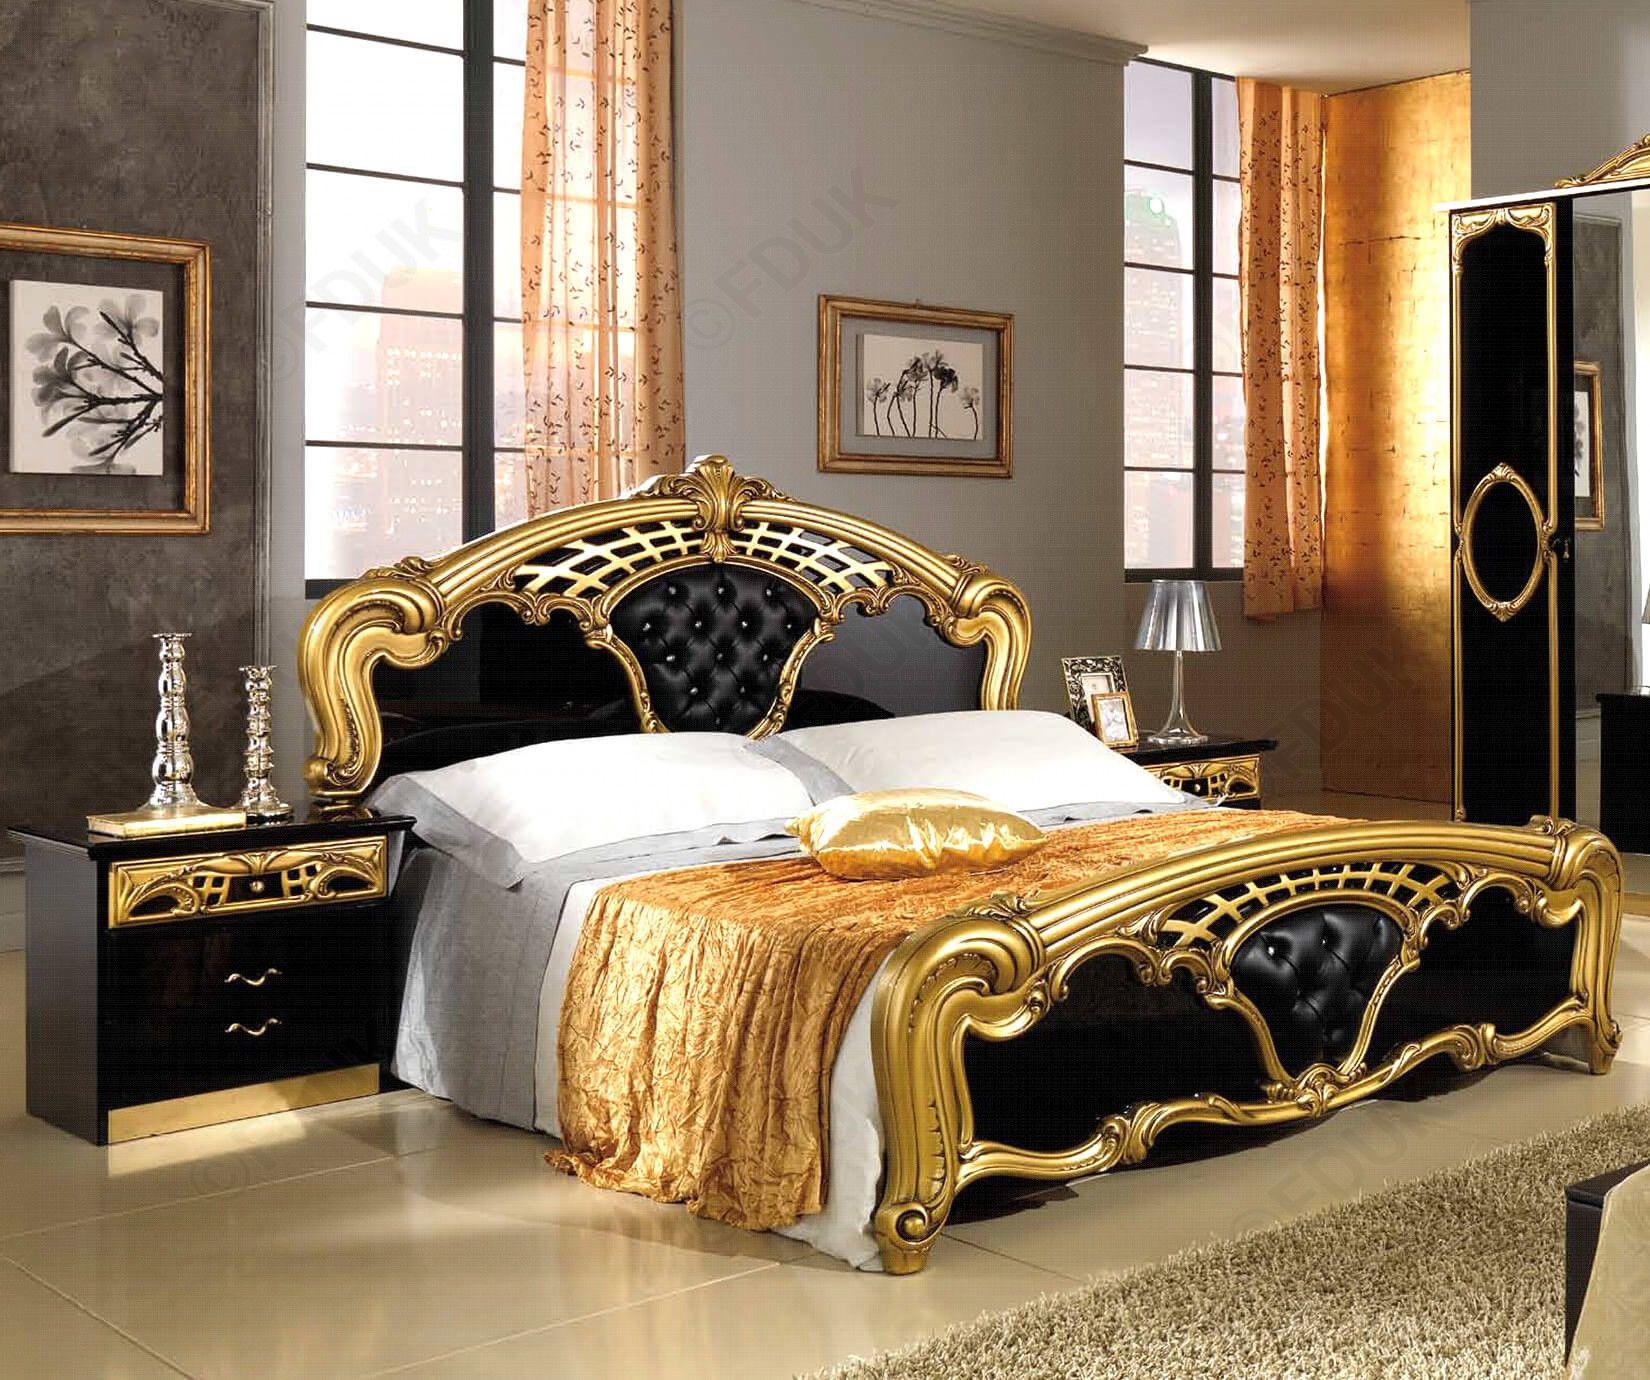 Golden Bedroom Furniture Black And Gold ゴールデンベッドルームの